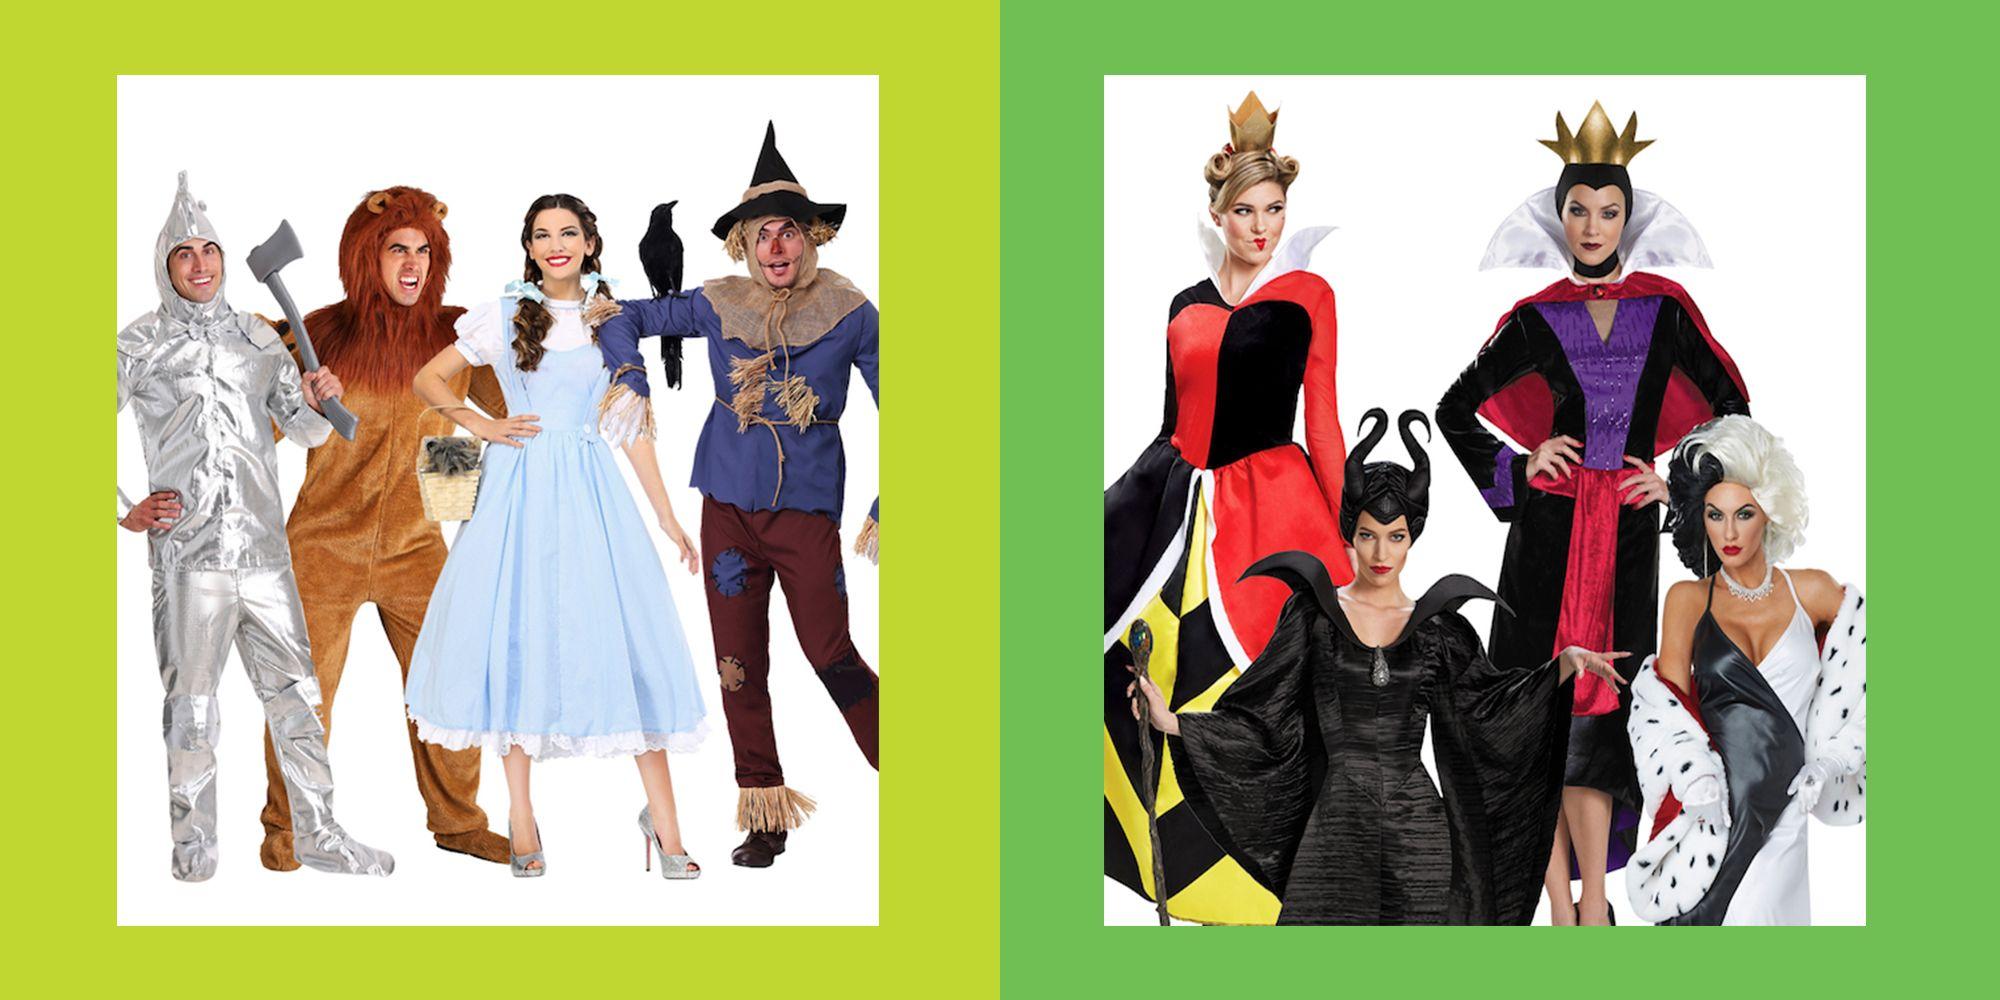 e61539b58 Cute Group Halloween Costume Ideas - Easy Friend Halloween Costumes